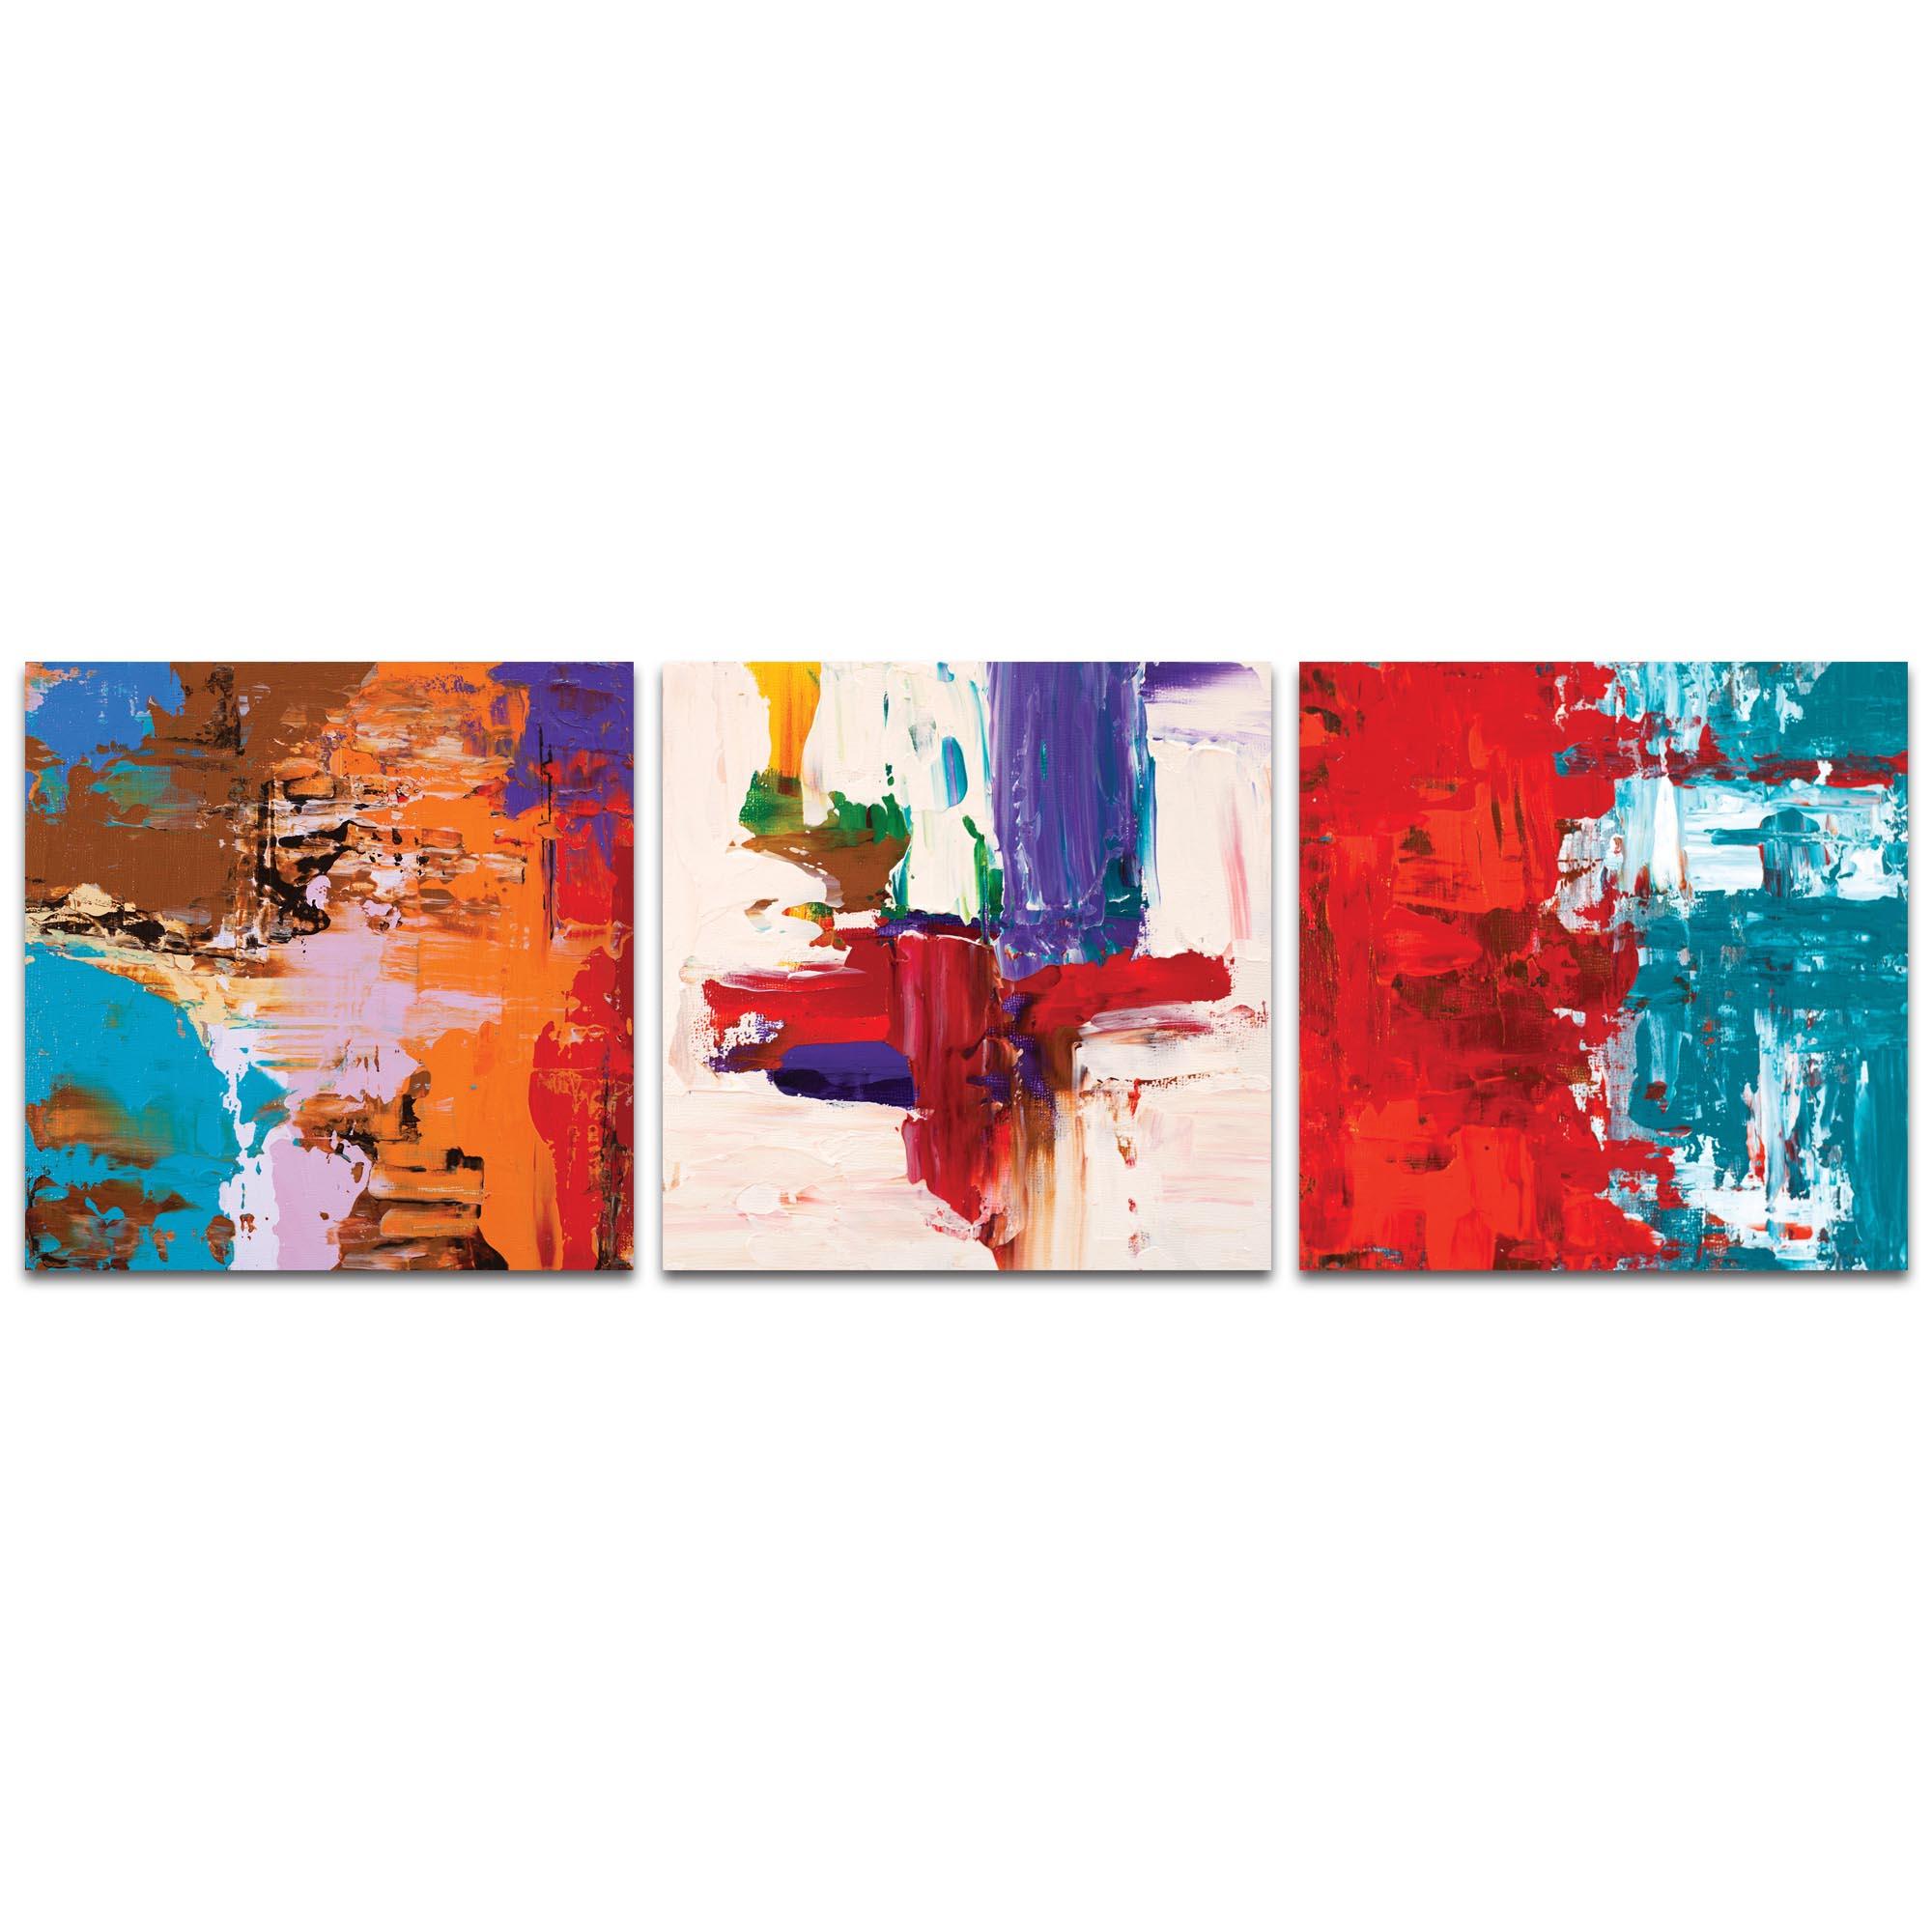 Abstract Wall Art Urban Triptych 5 Large Decor On Metal Or Plexigl